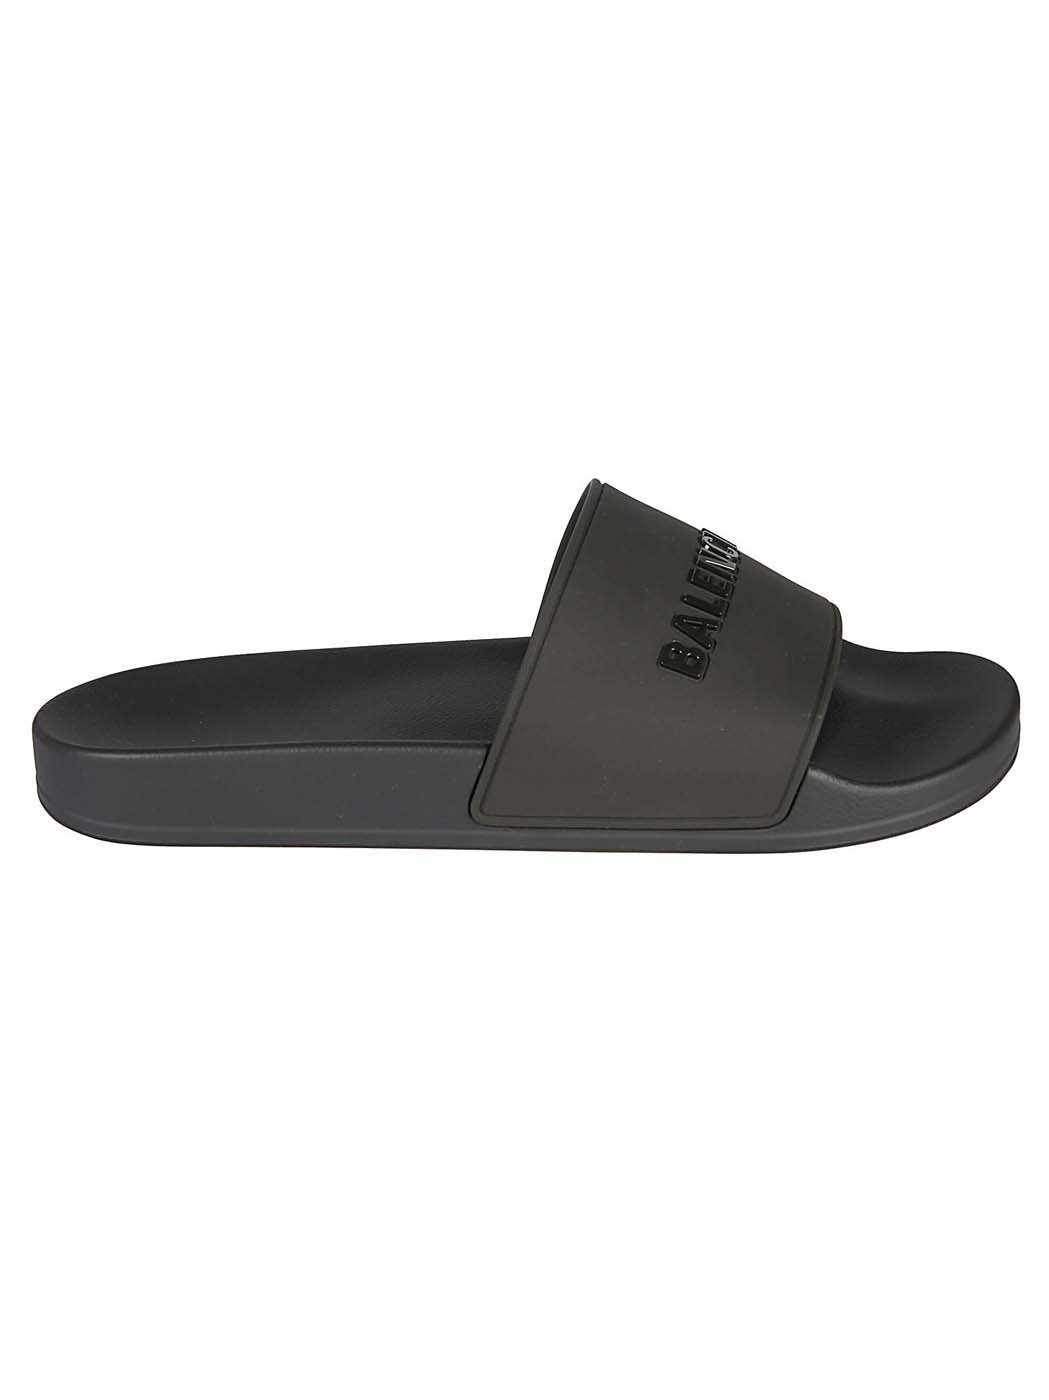 Balenciaga Sandals Black